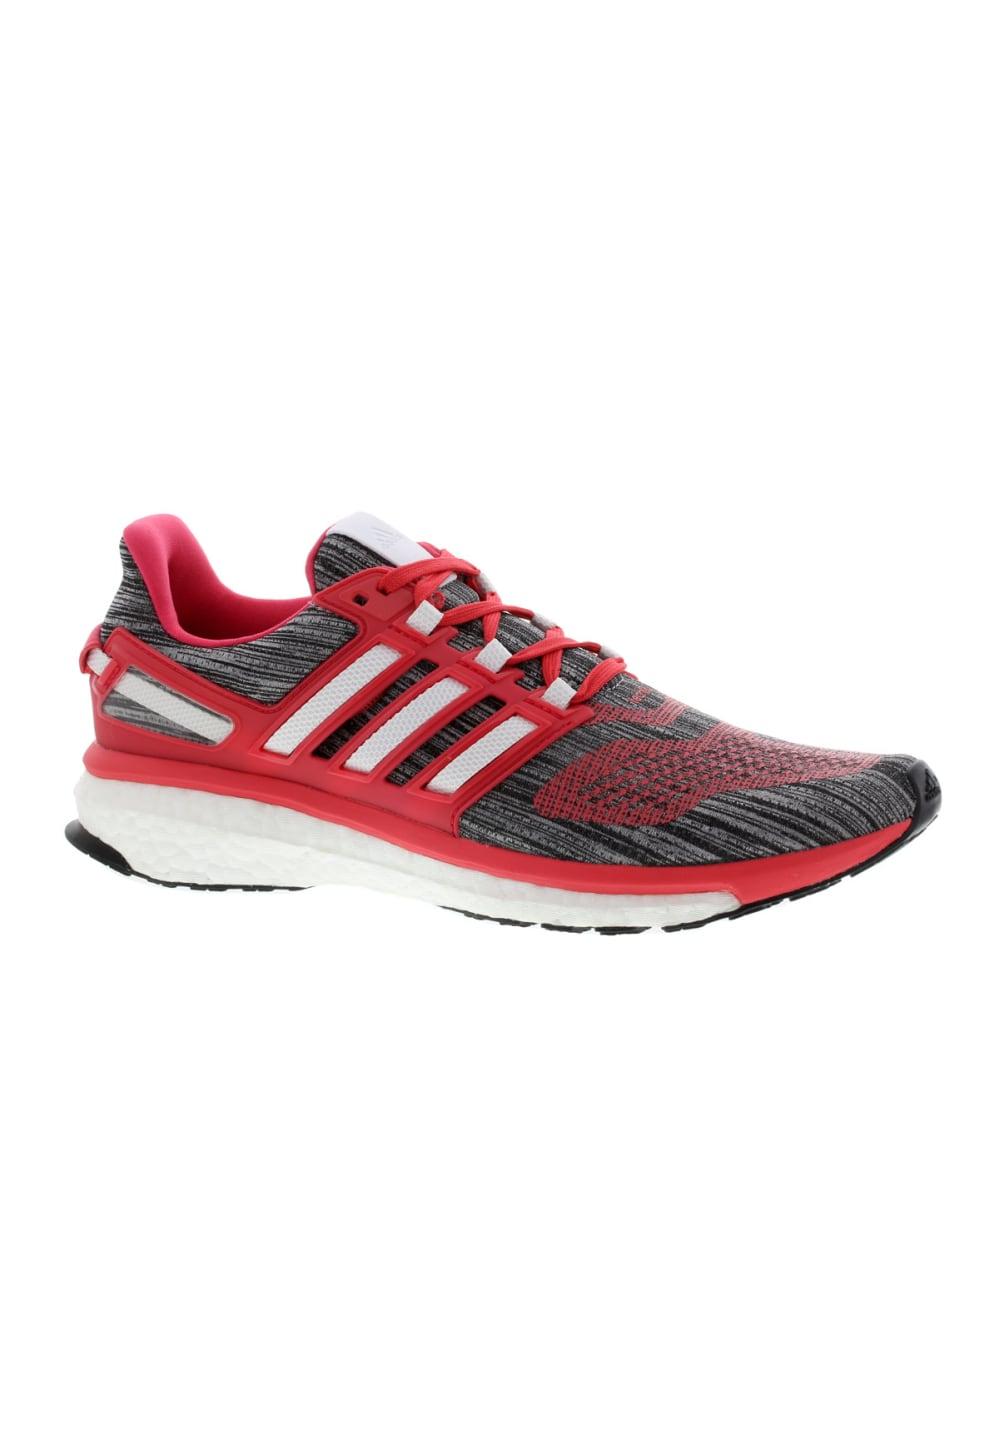 Boost Energy Chaussures 21run Adidas Gris Femme Running 3 Pour qT6xAOn